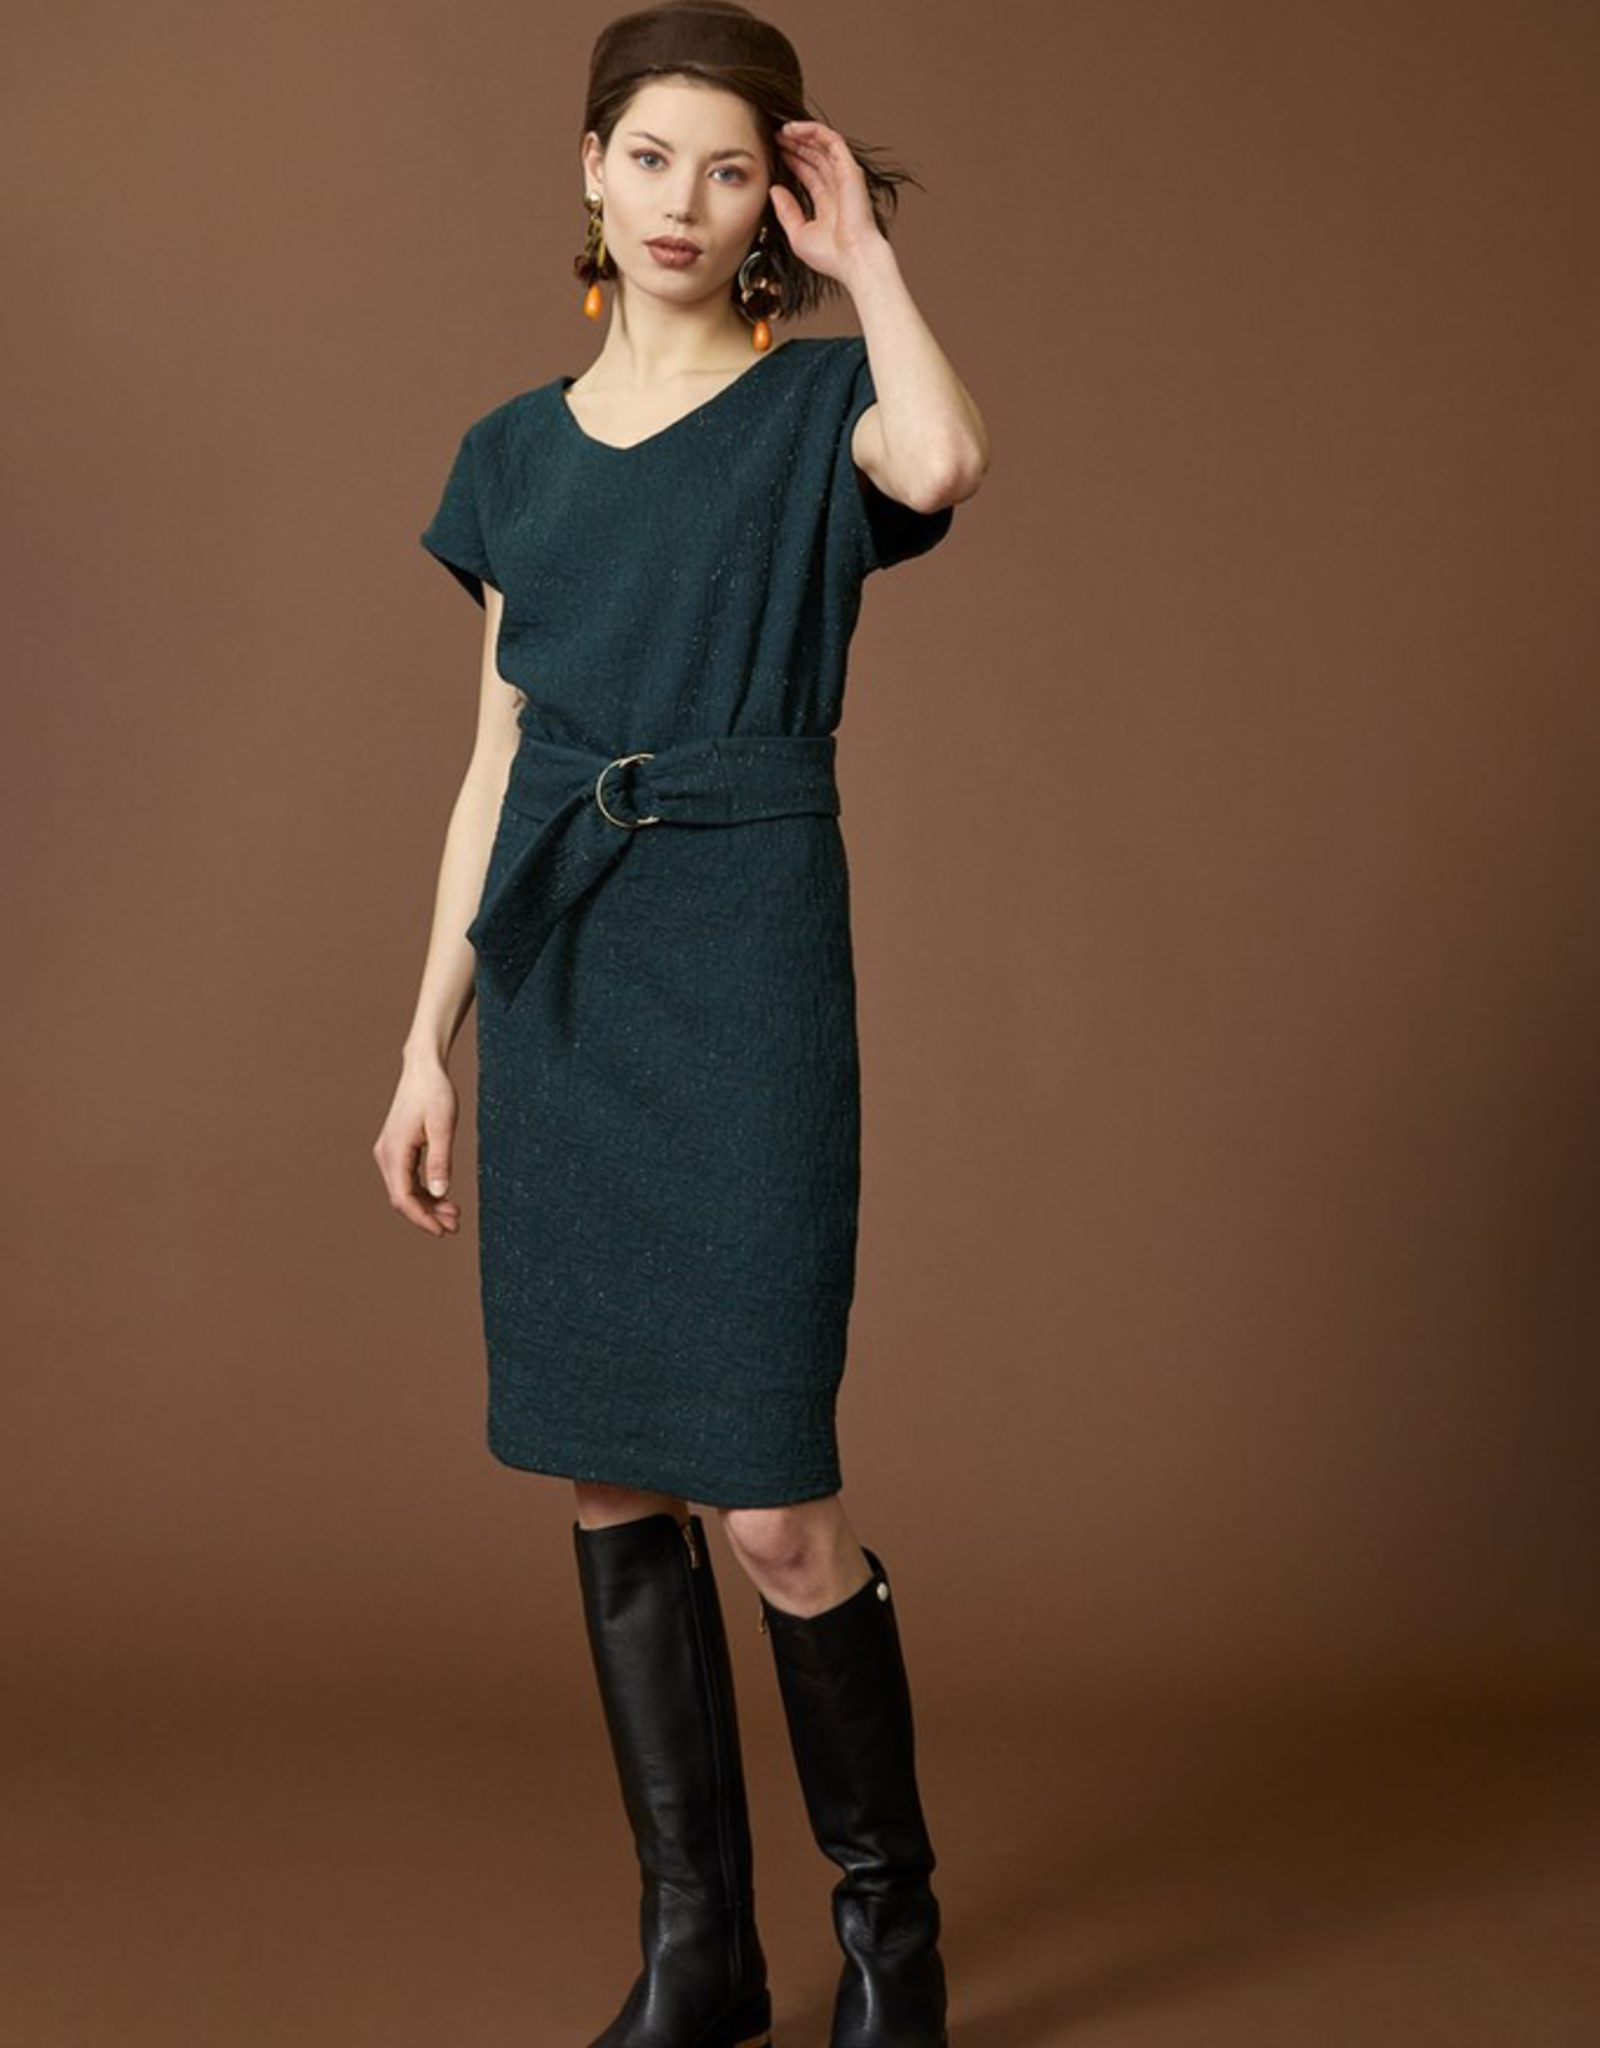 Cassiopee Dress